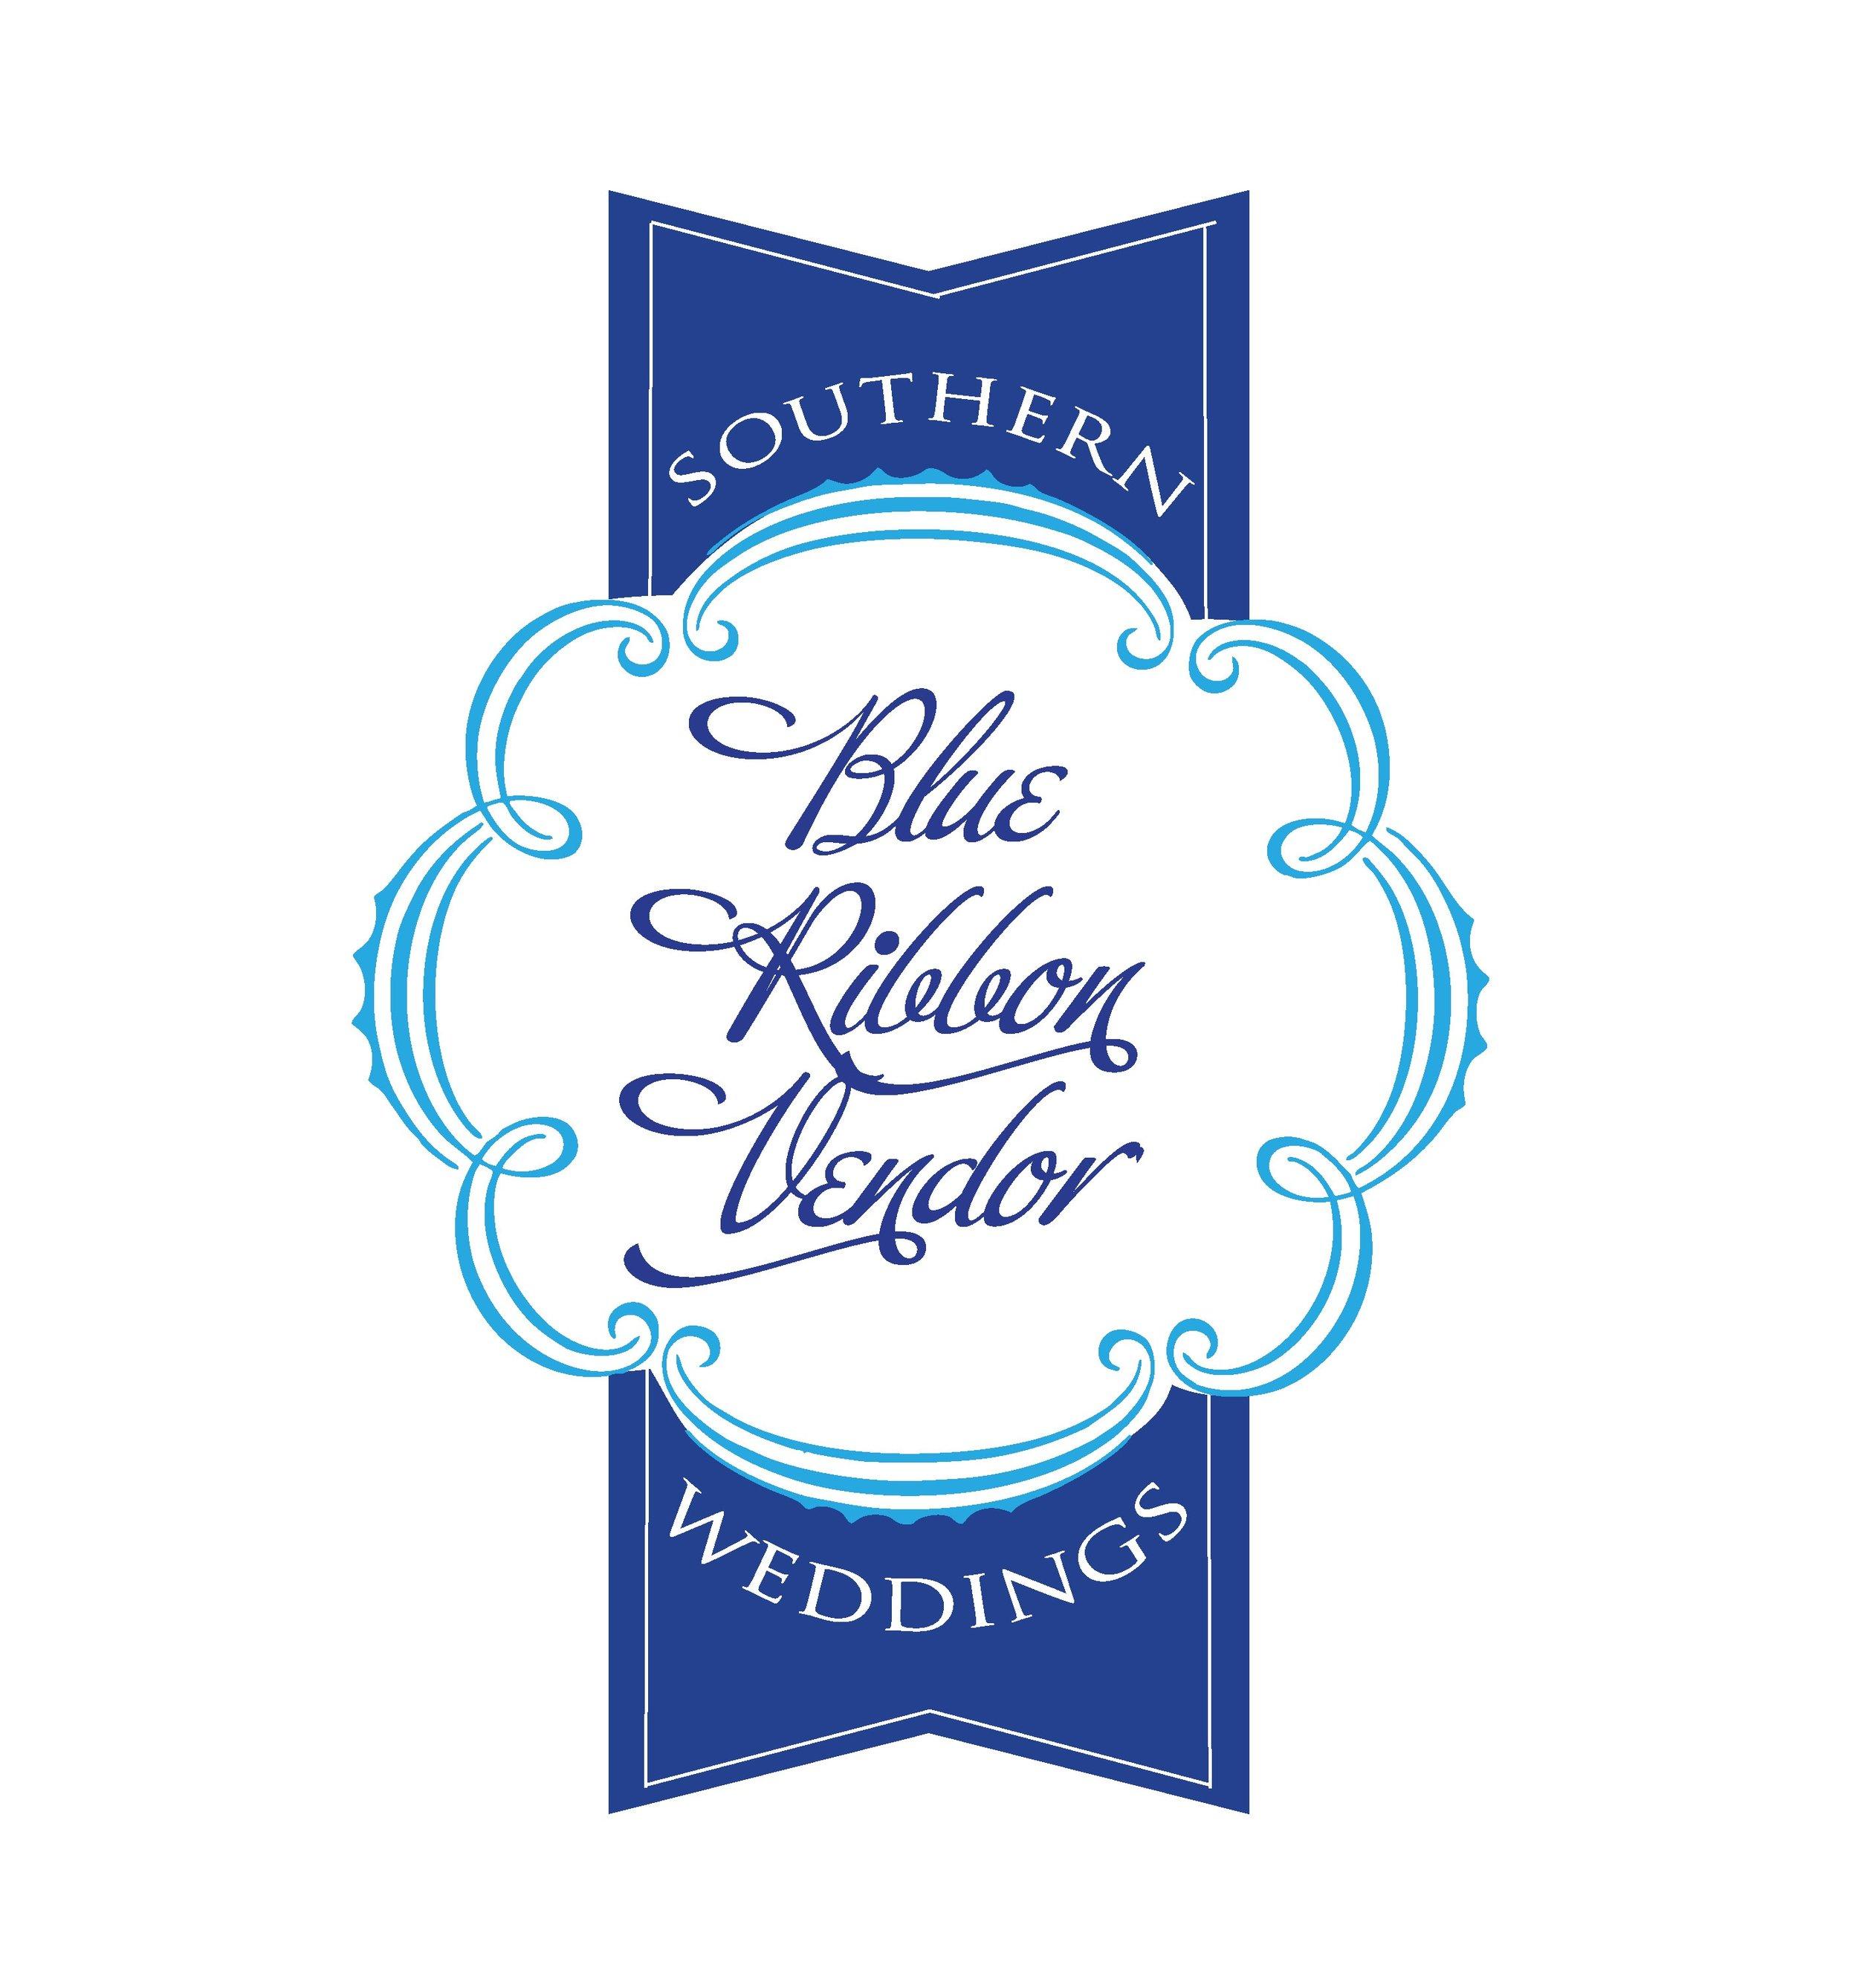 Southern Weddings Blue Ribbon official badge 2011 2012.jpg